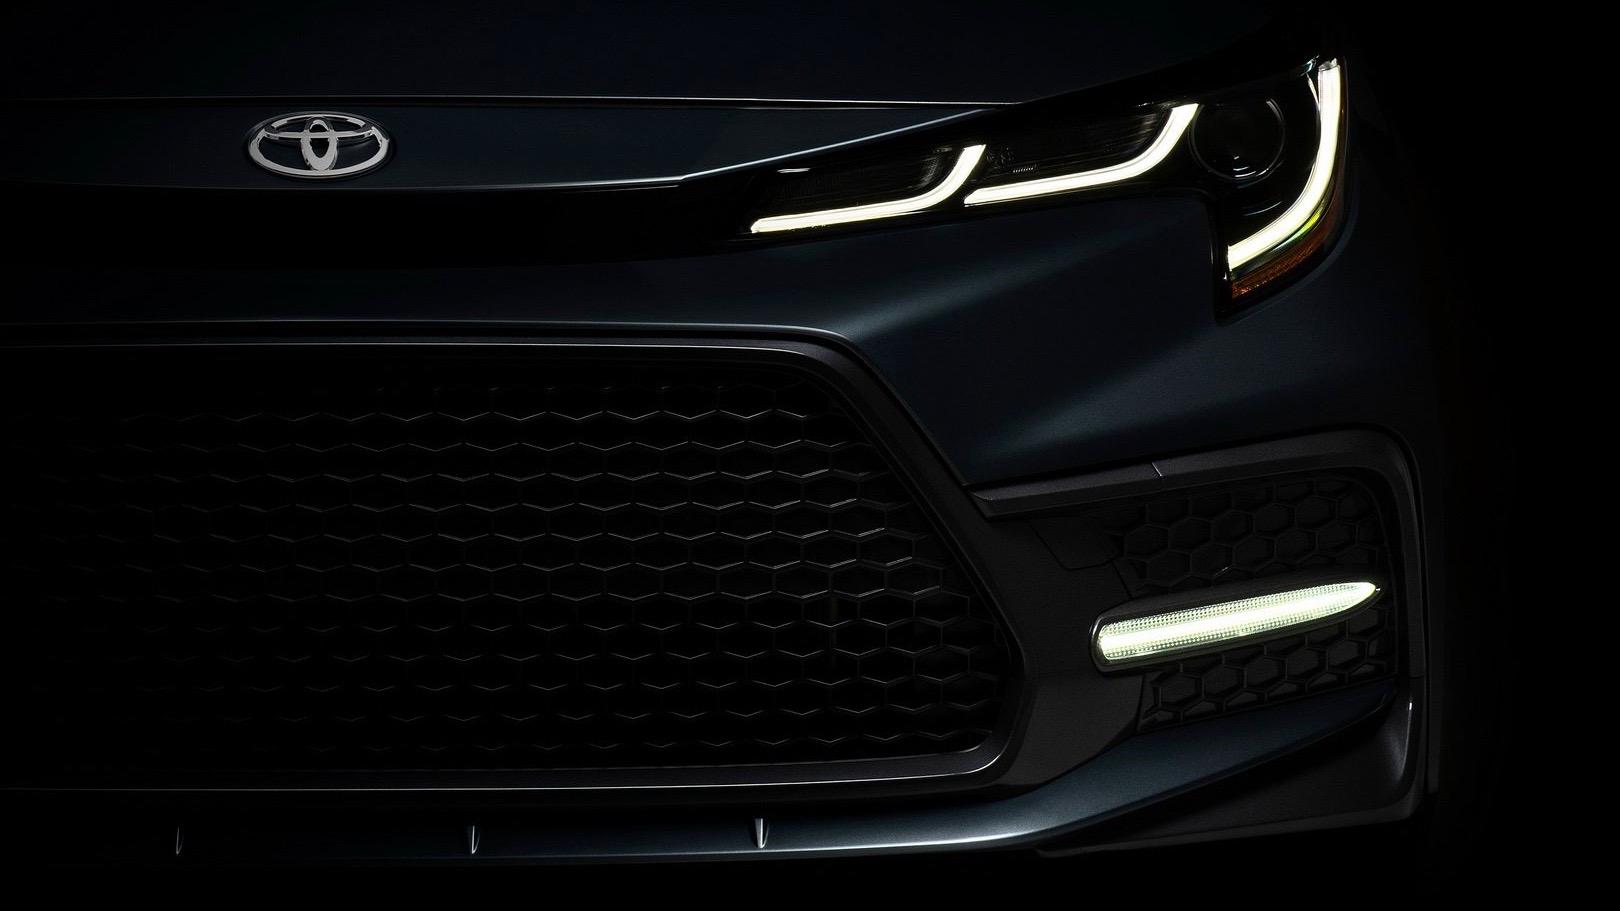 2019 Toyota Corolla sedan teaser